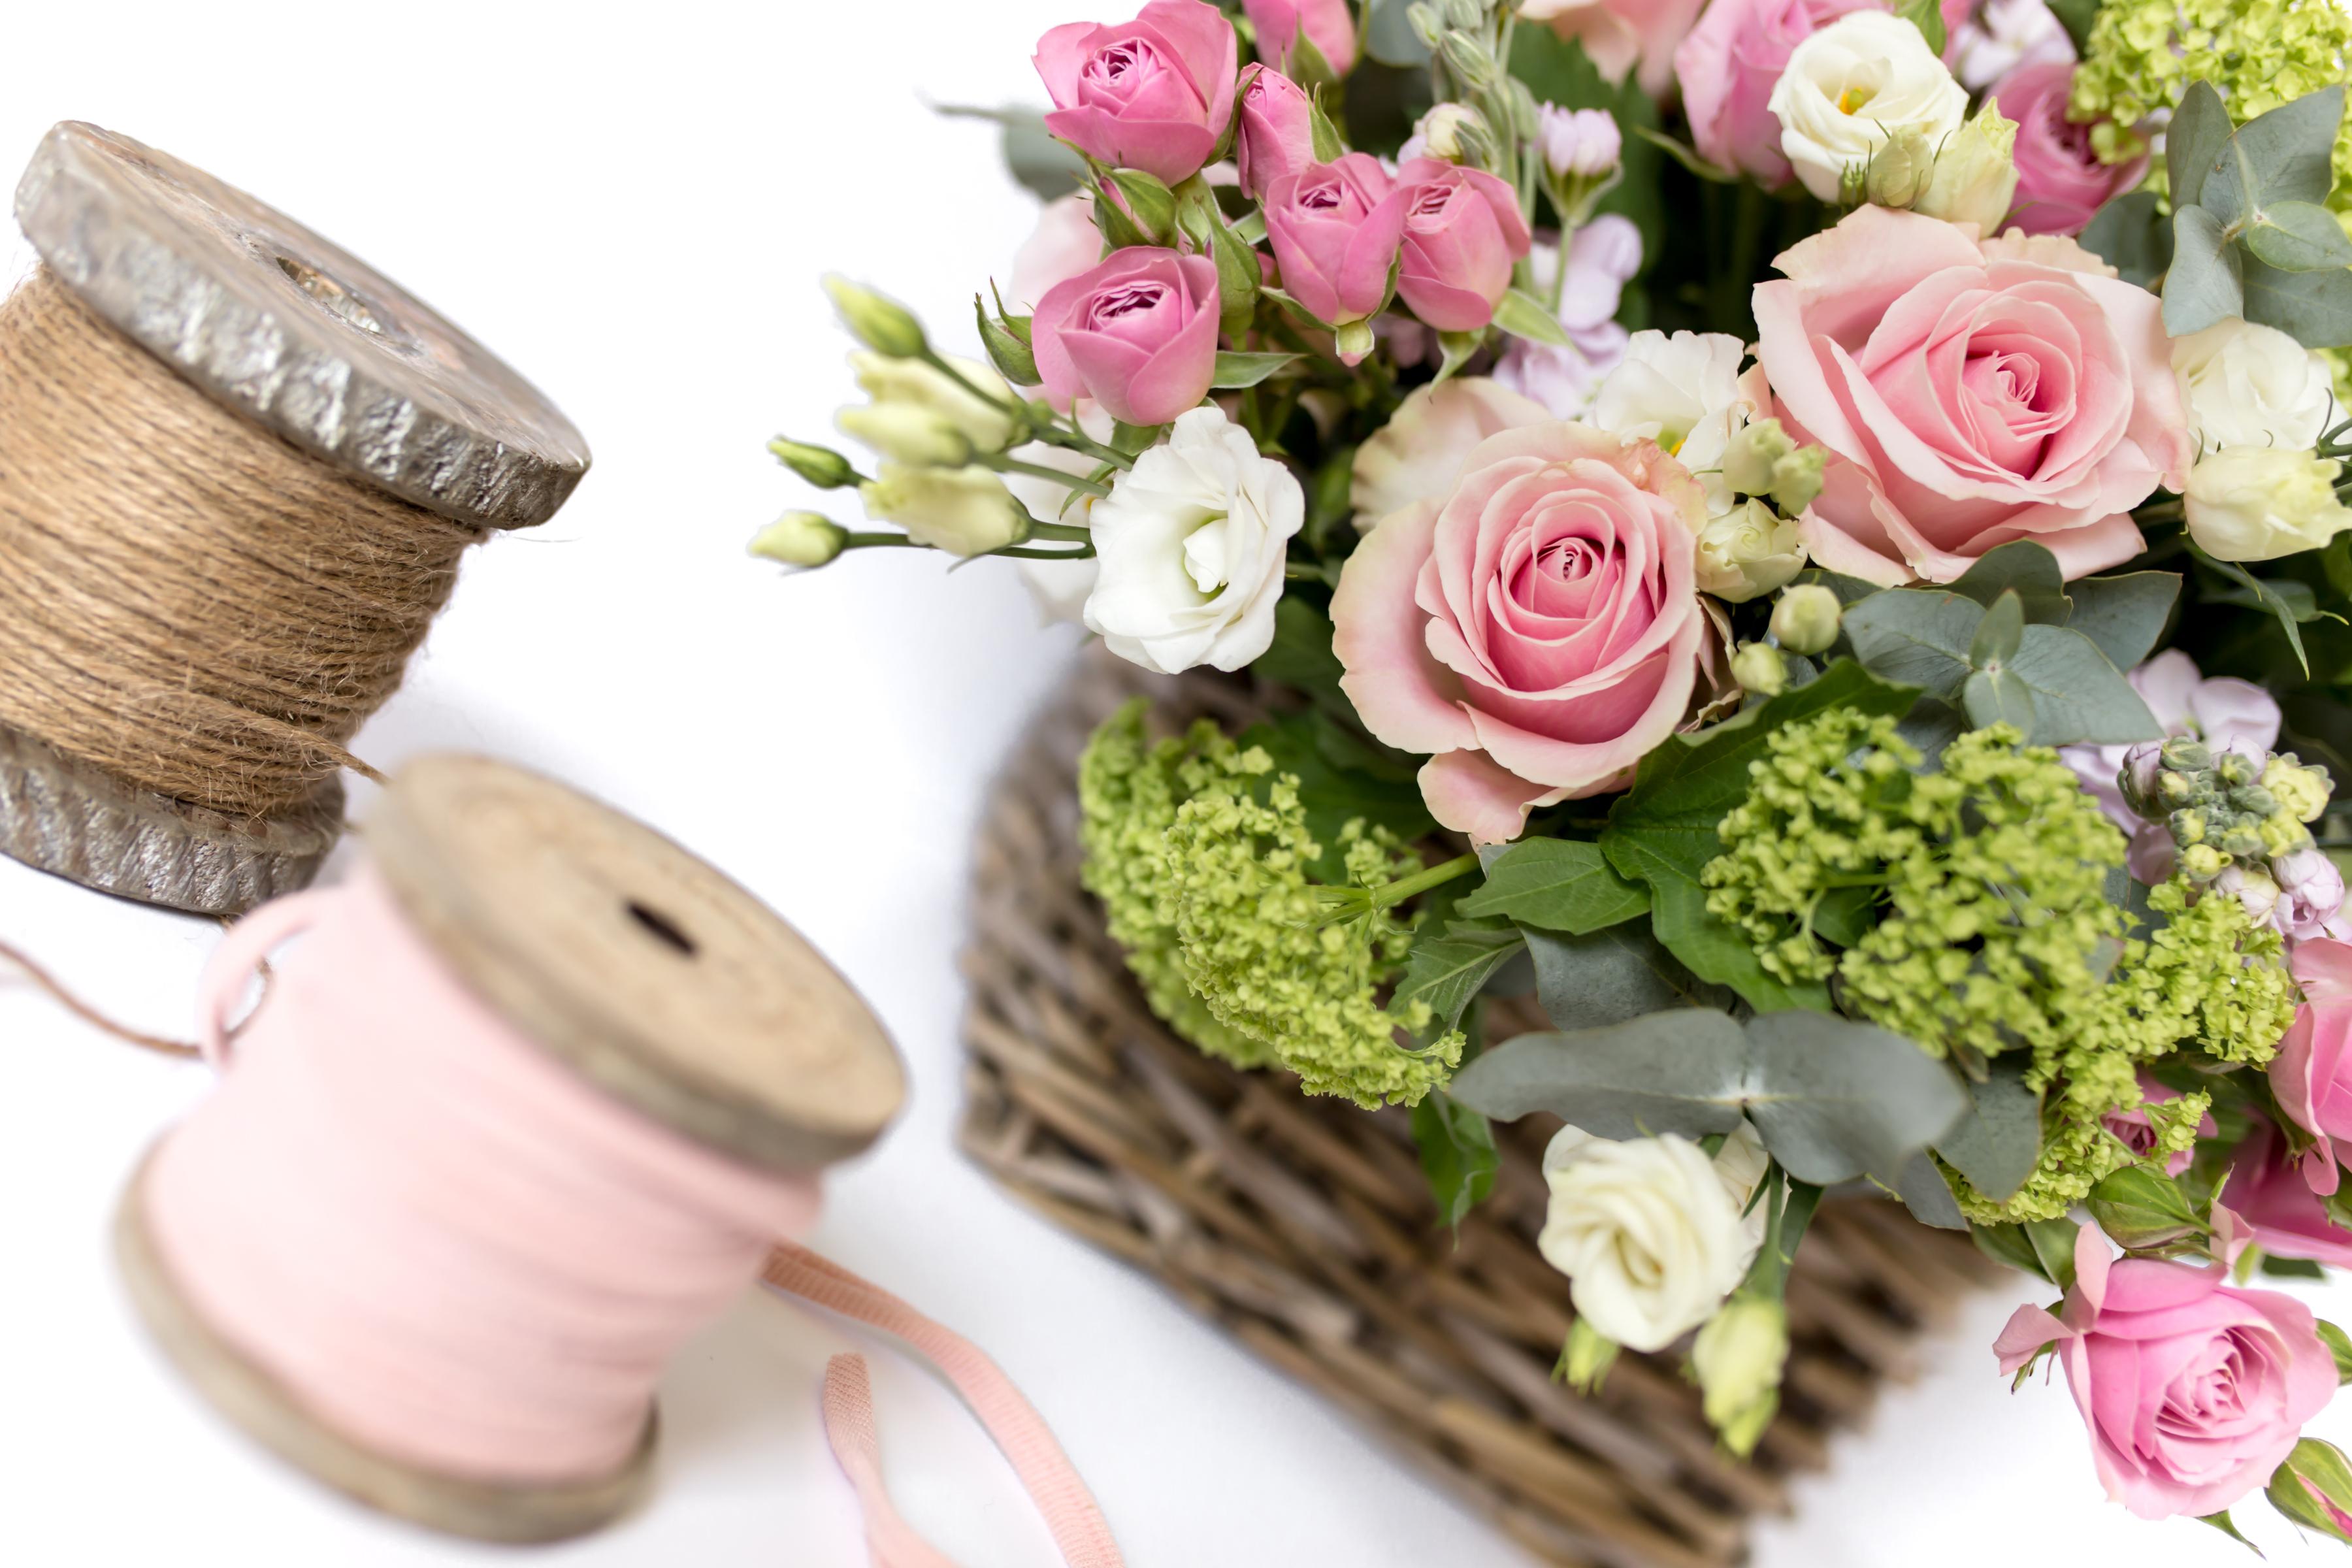 Daisy Lane Floral Design Bristol Mother's Day Bouquet